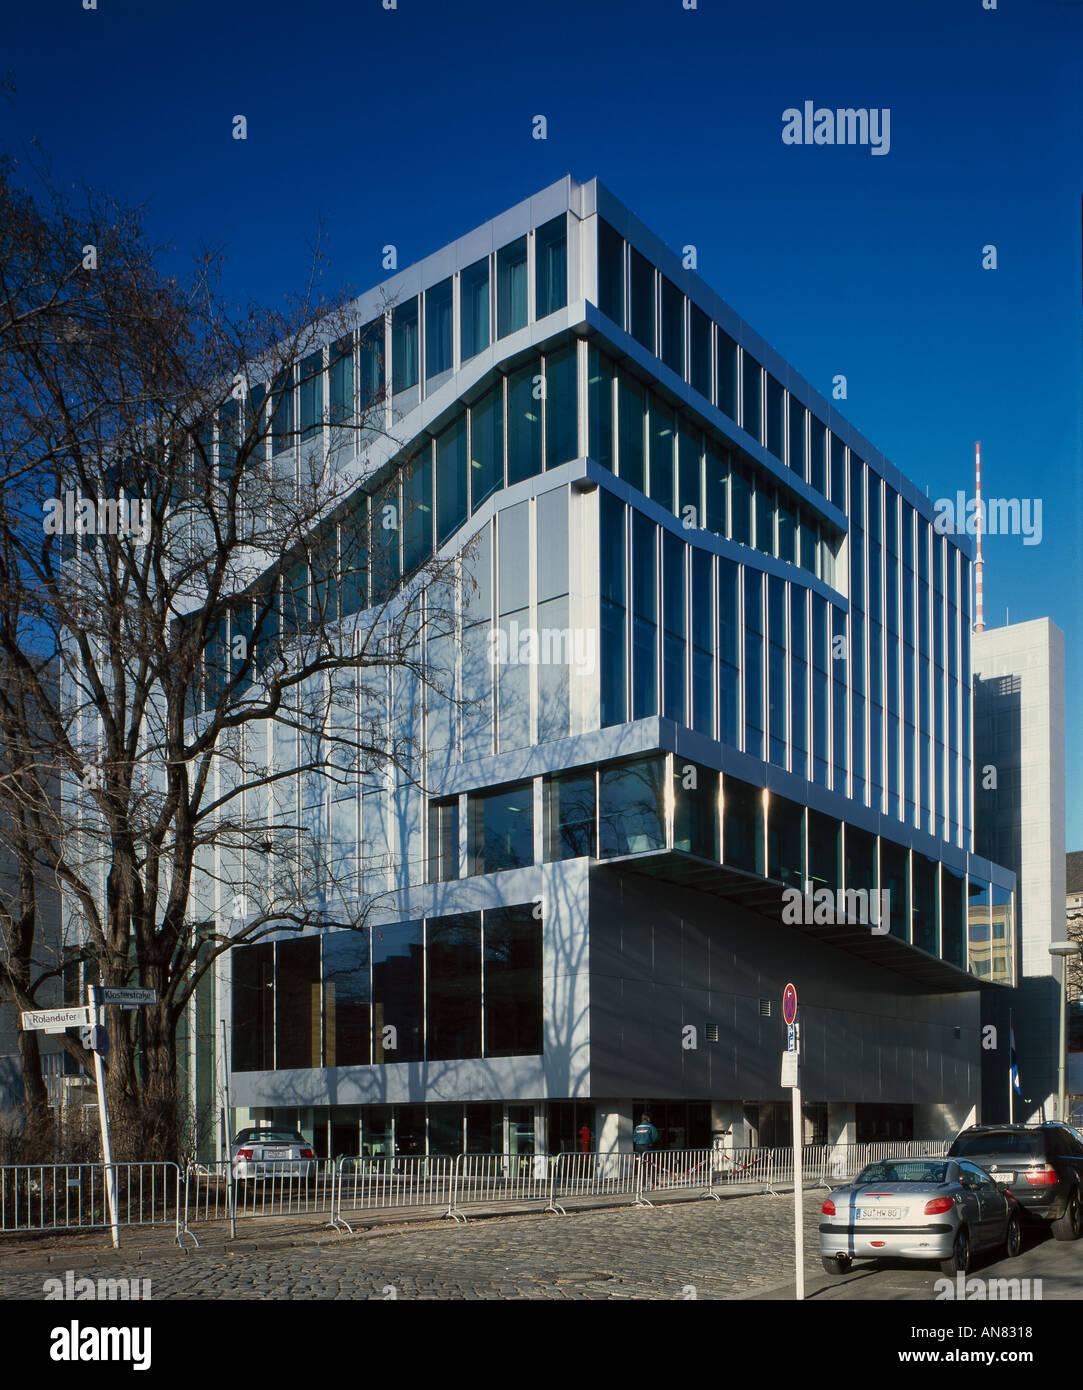 Netherlands Embassy, Berlin. Exterior. Architect: Rem Koolhaas OMA - Stock Image